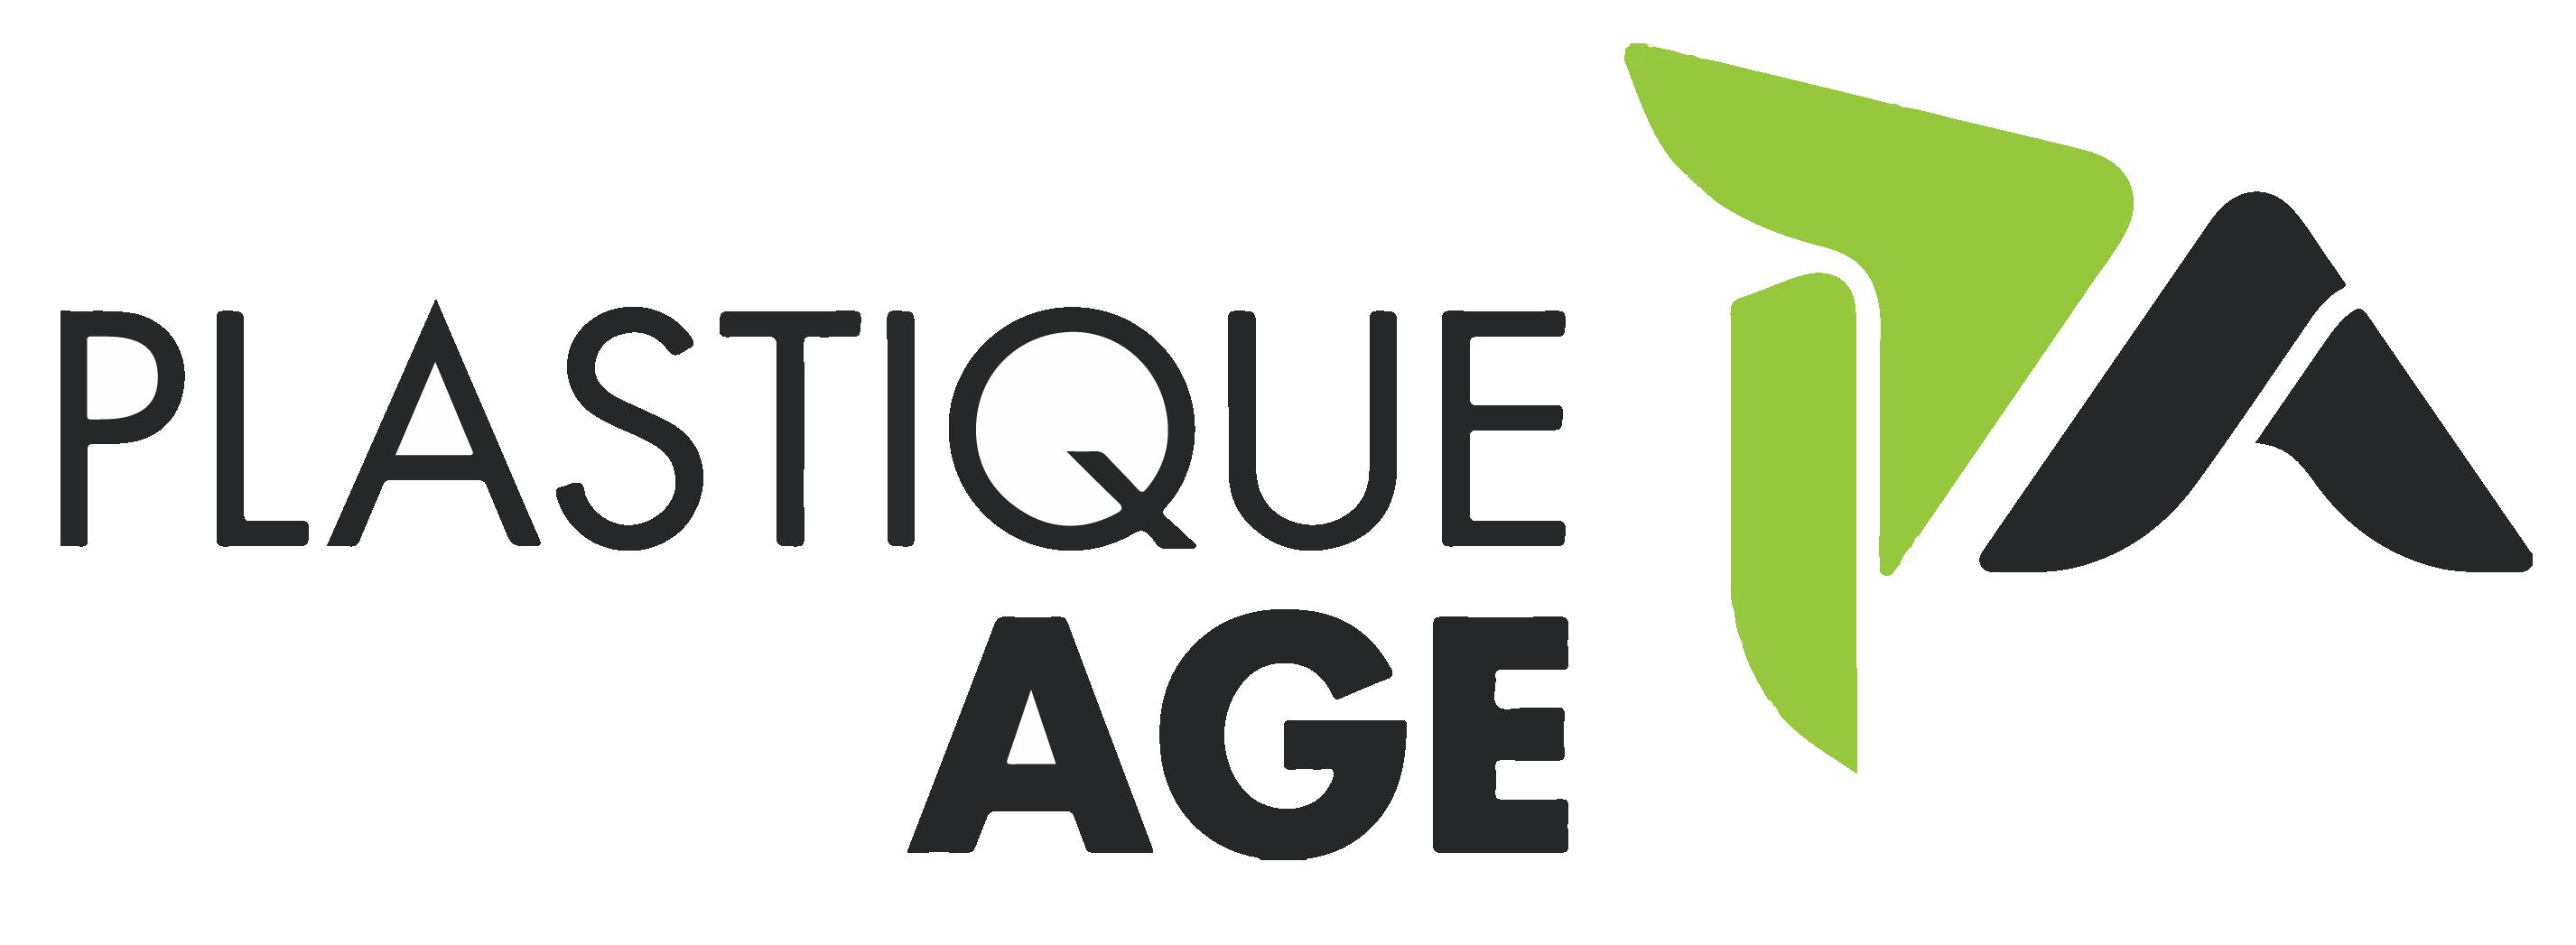 Plastique Age